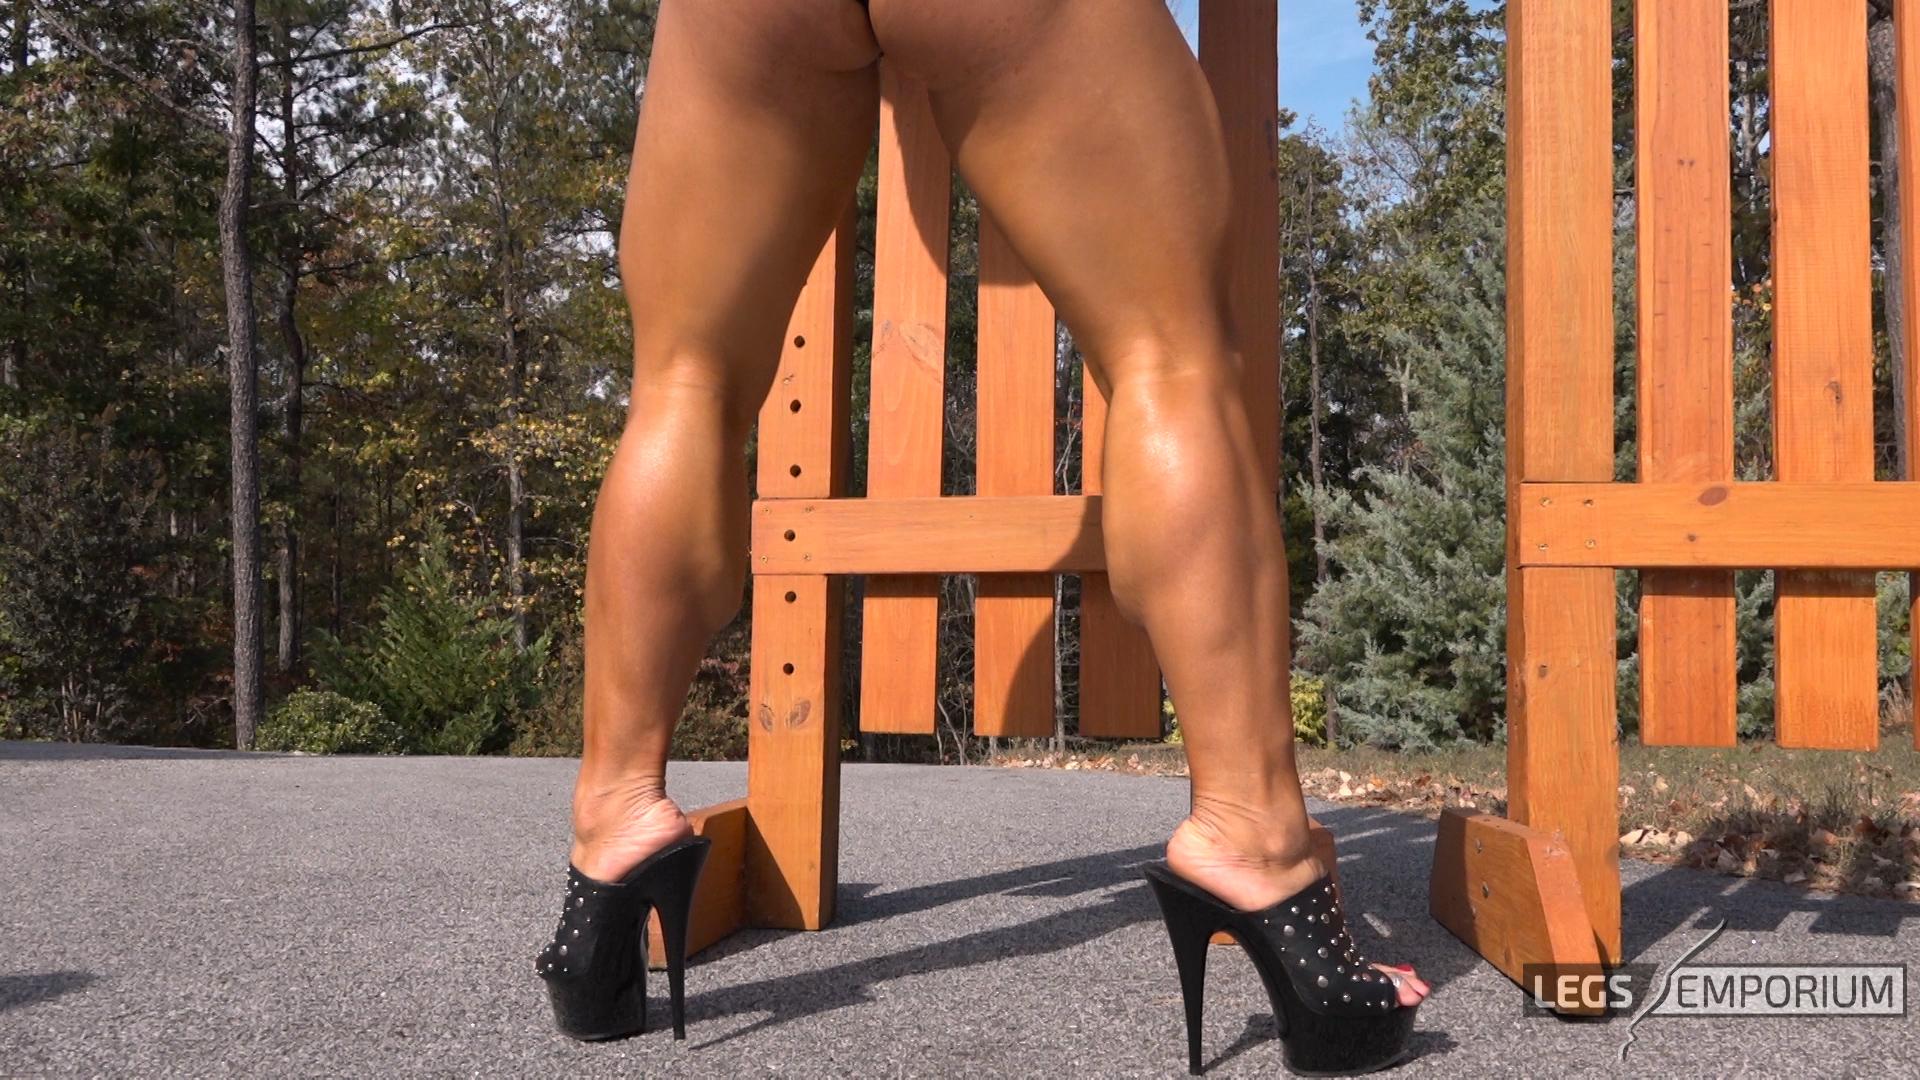 January jones flaunts incredible legs in high